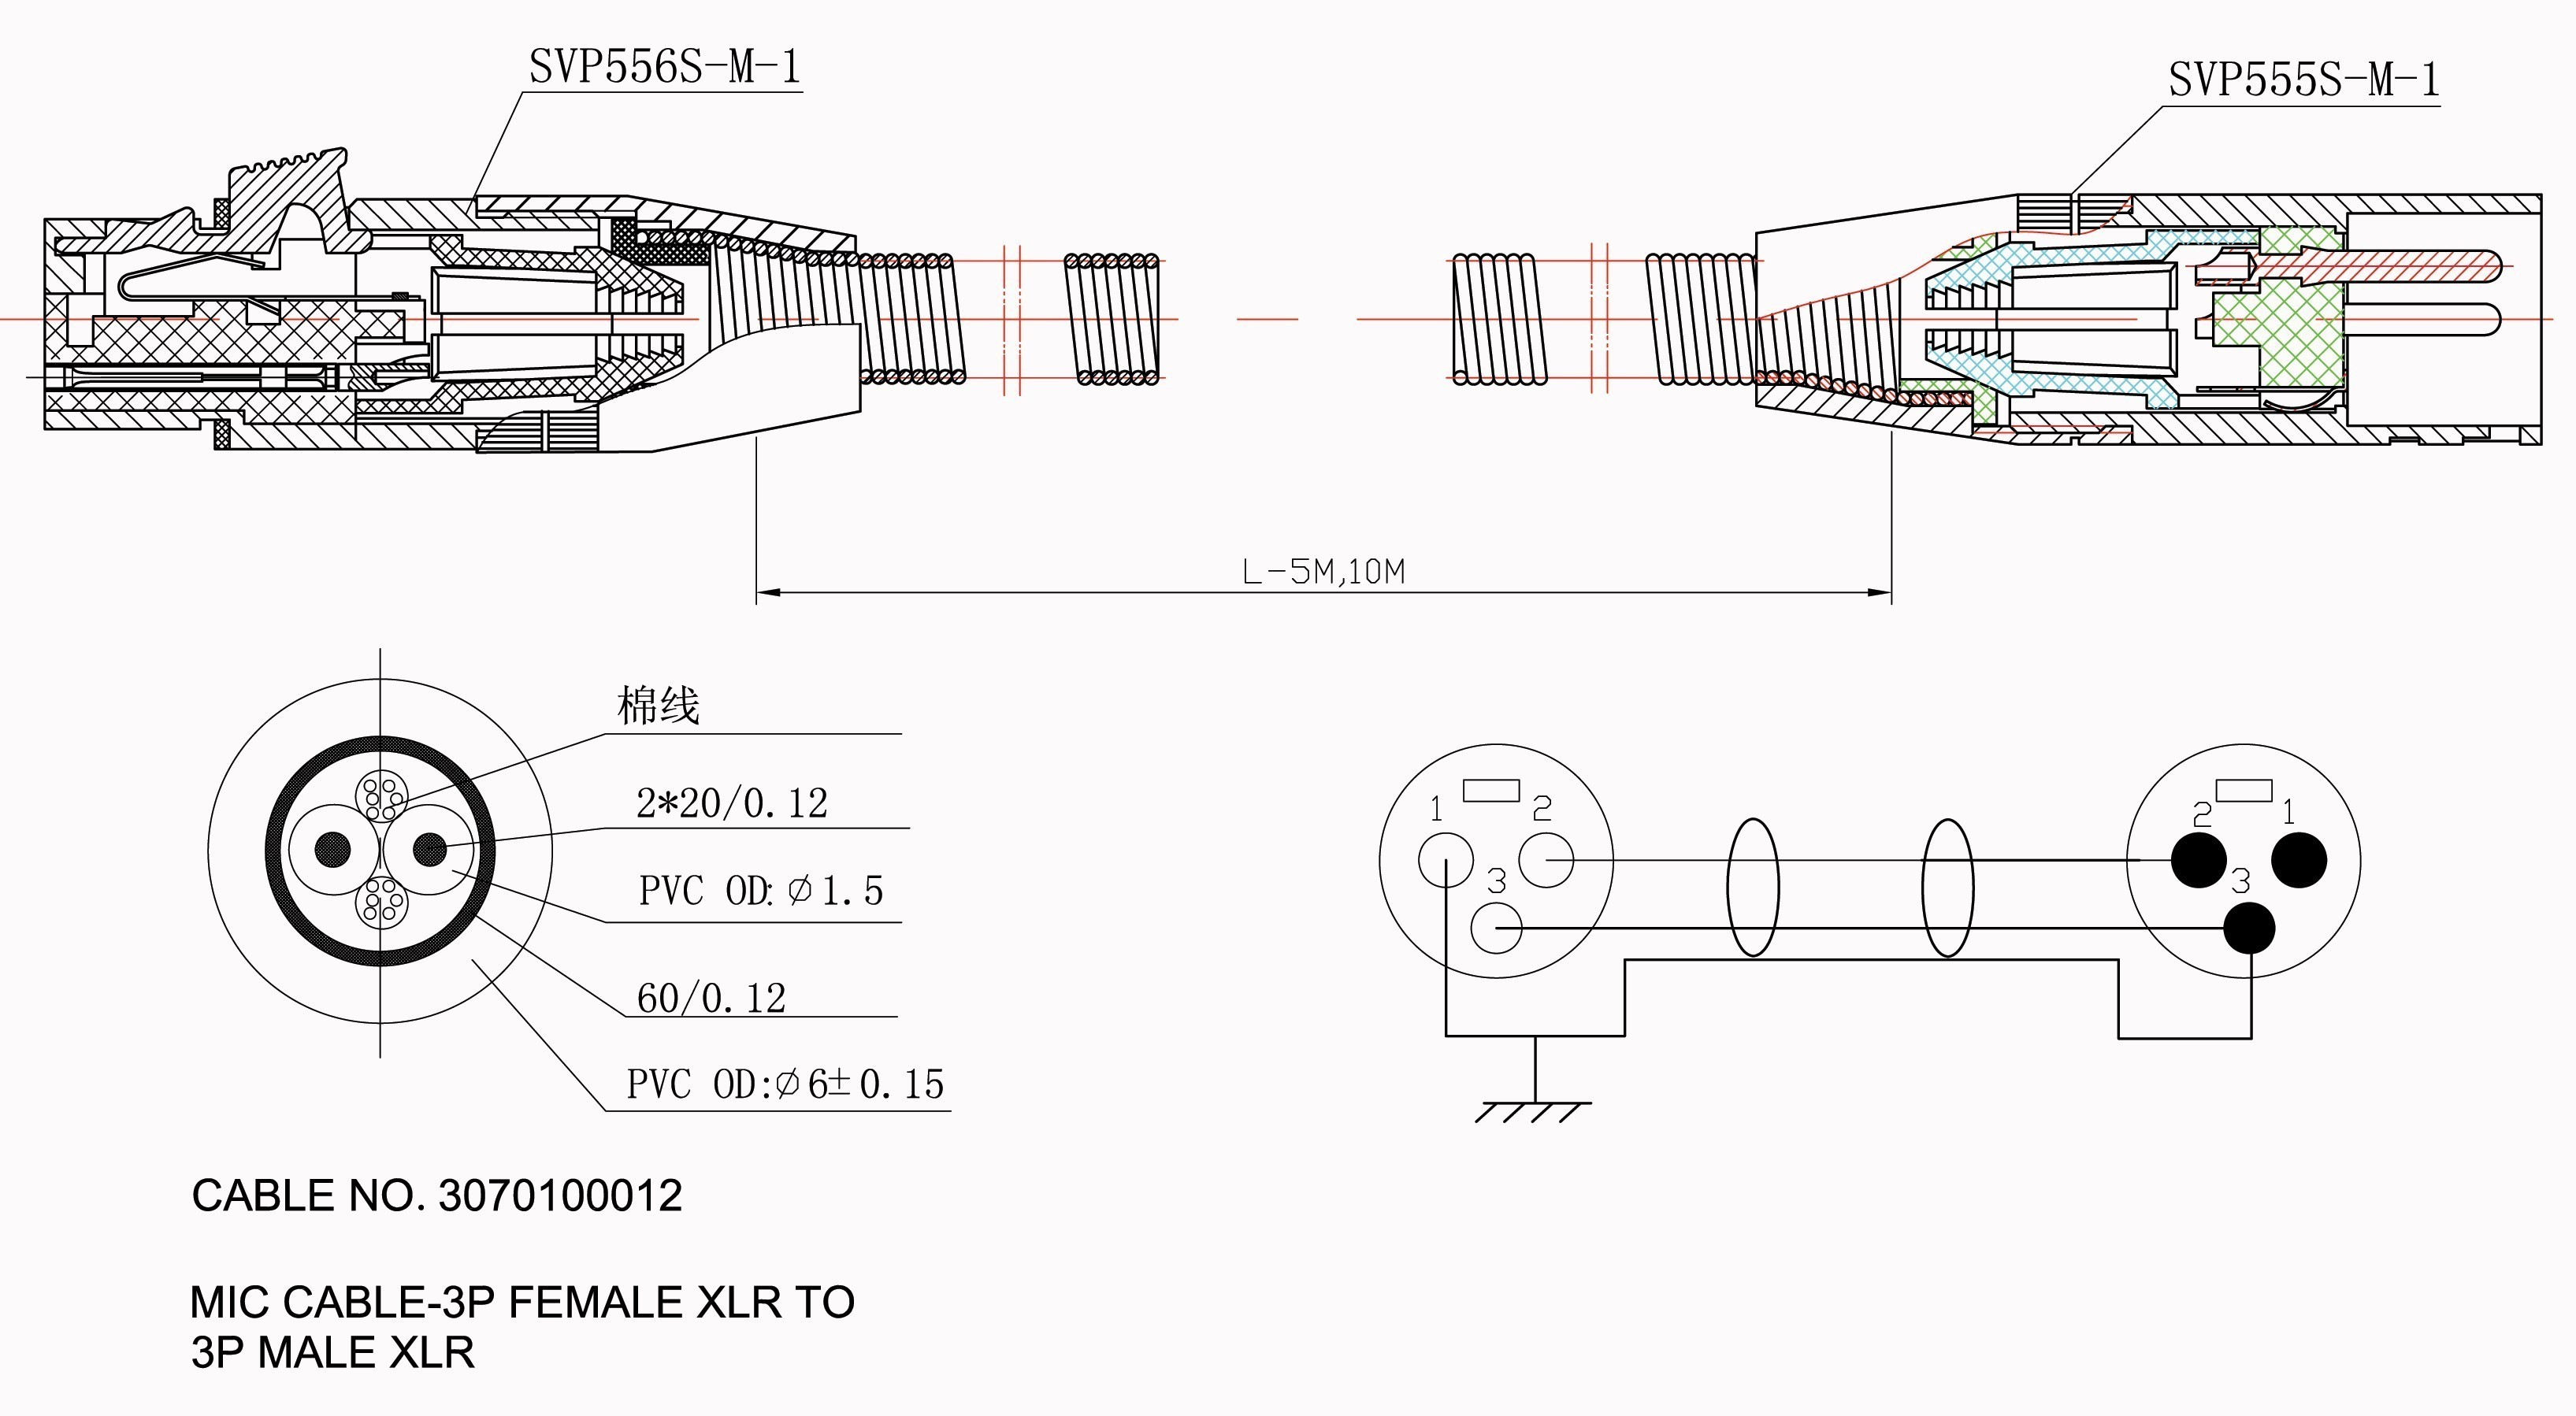 Wiring Diagram Recessed Lighting Refrence Wiring Diagram Dali Lighting Inspirationa Dmx Lighting Wiring